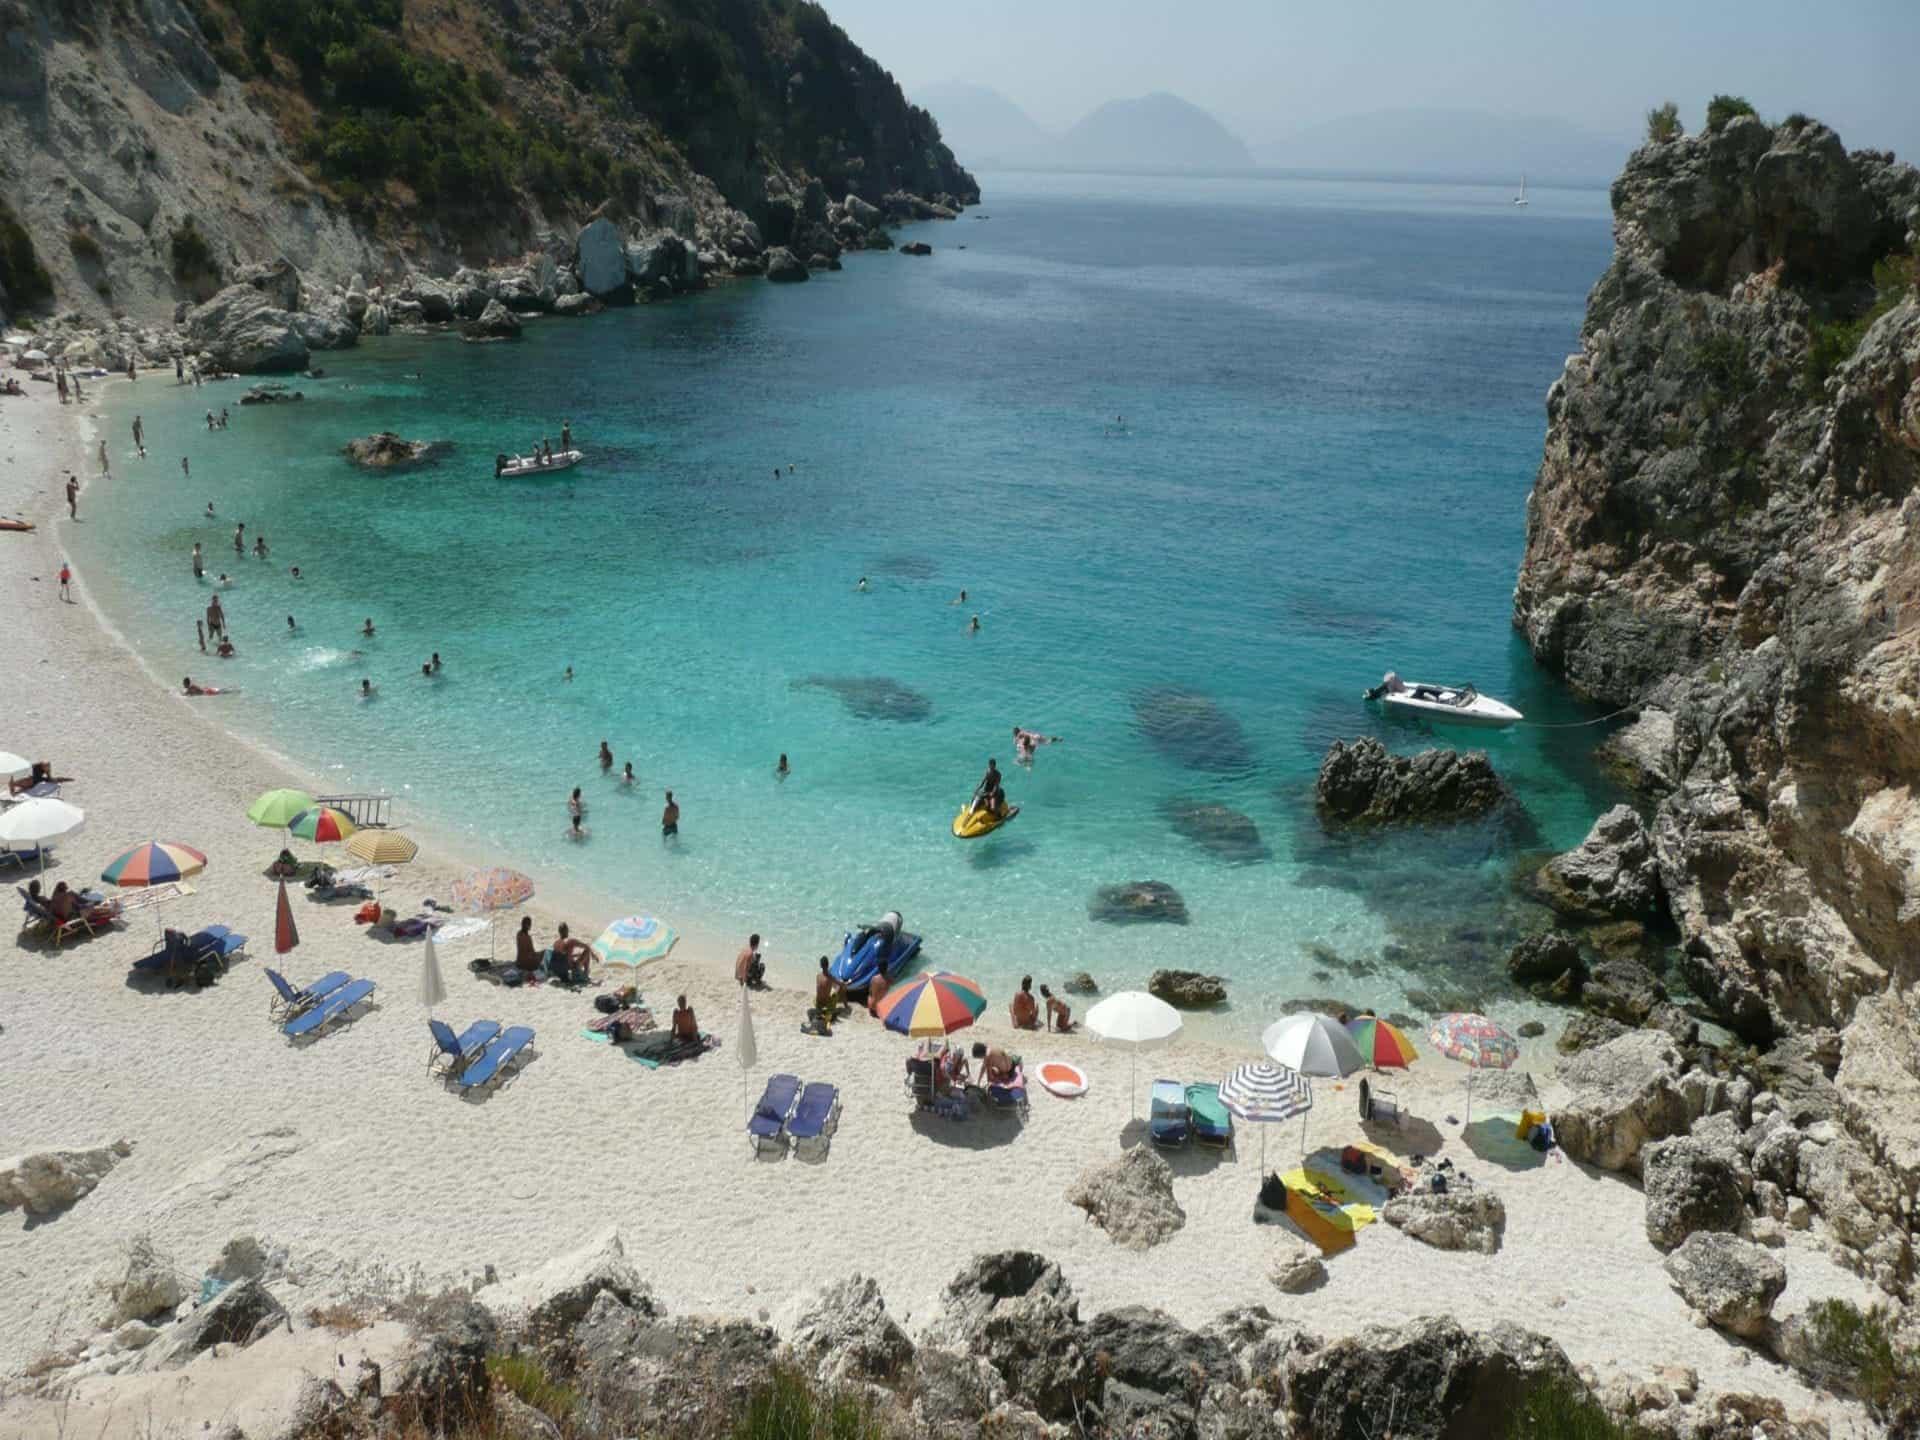 Lefkada Beaches - Lefkas Beaches - Lefkada beaches